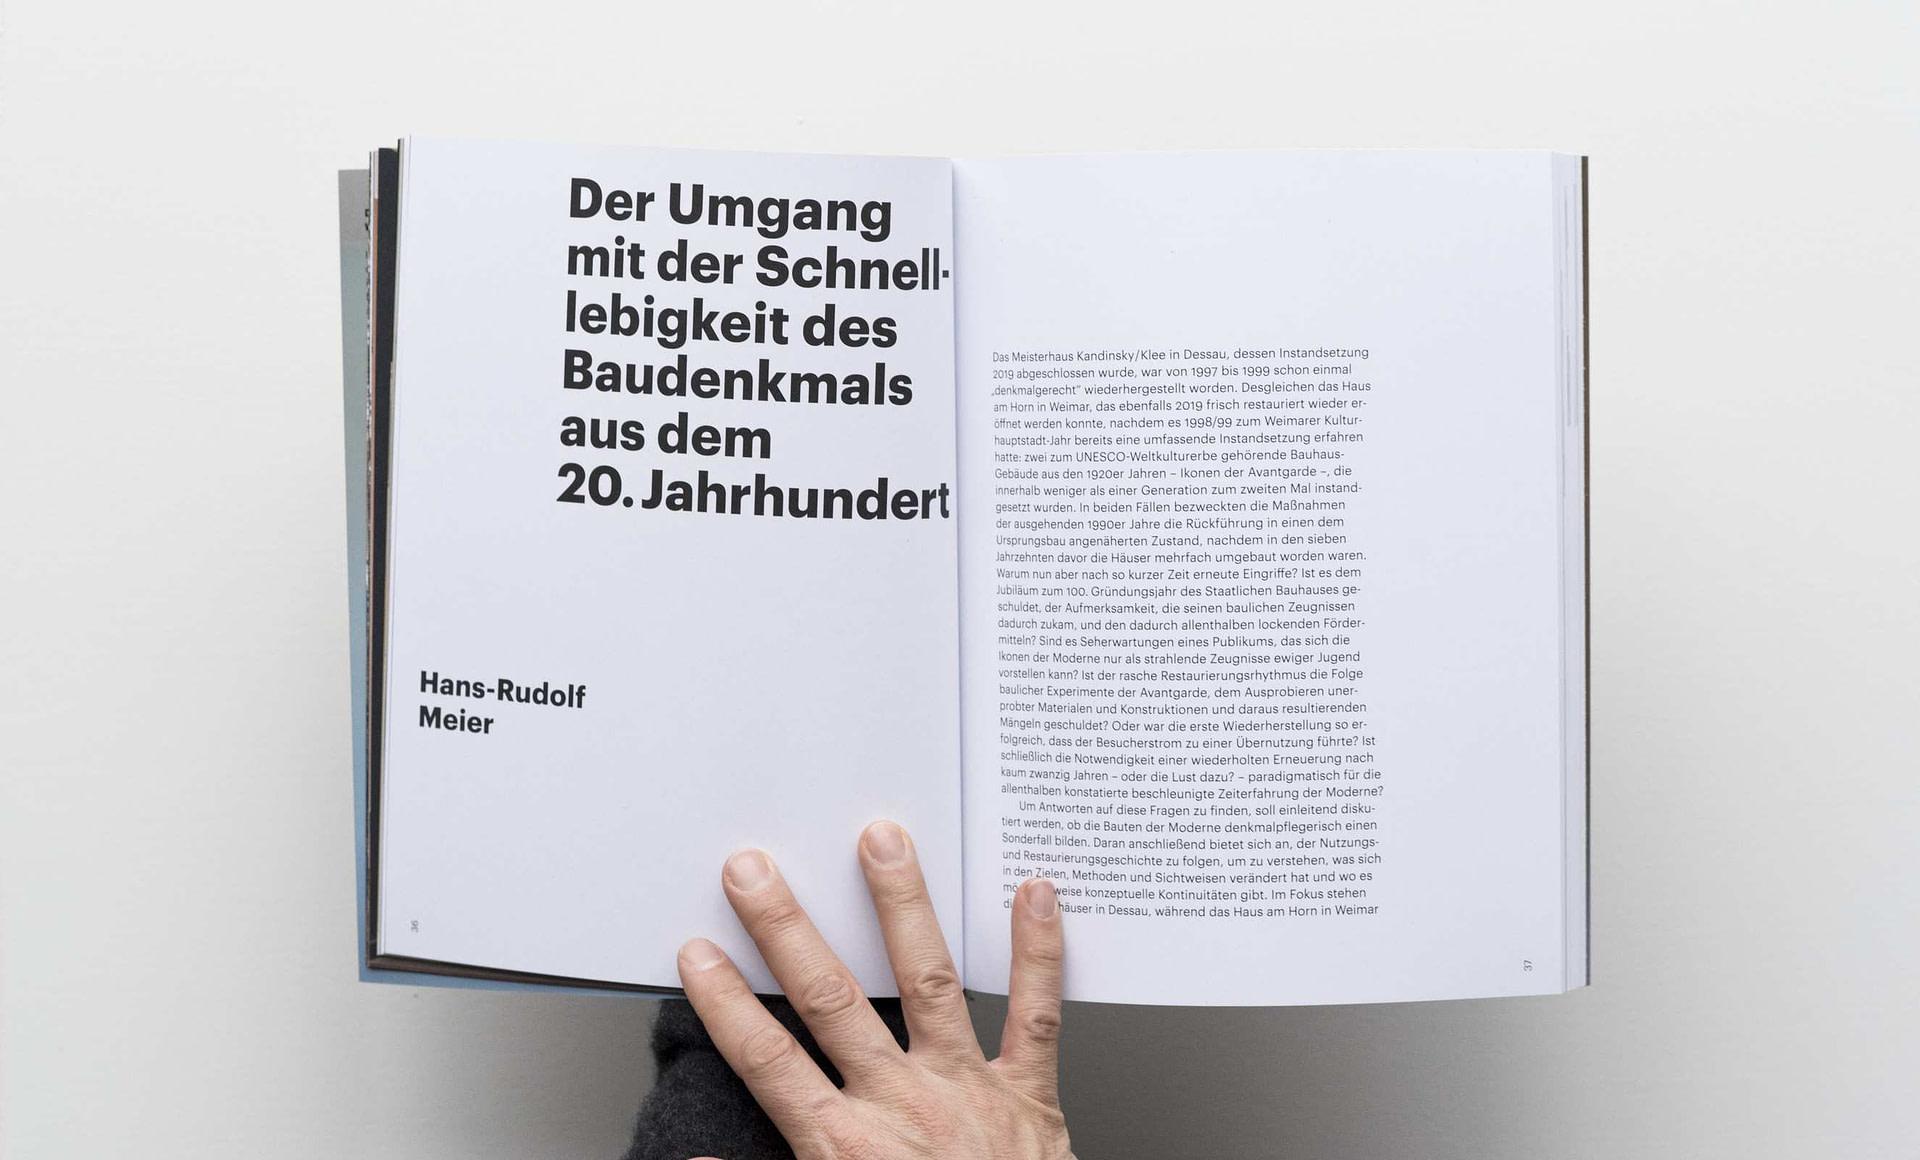 meisterhaus-kandinsky-klee-book-6-2650x1600px-1